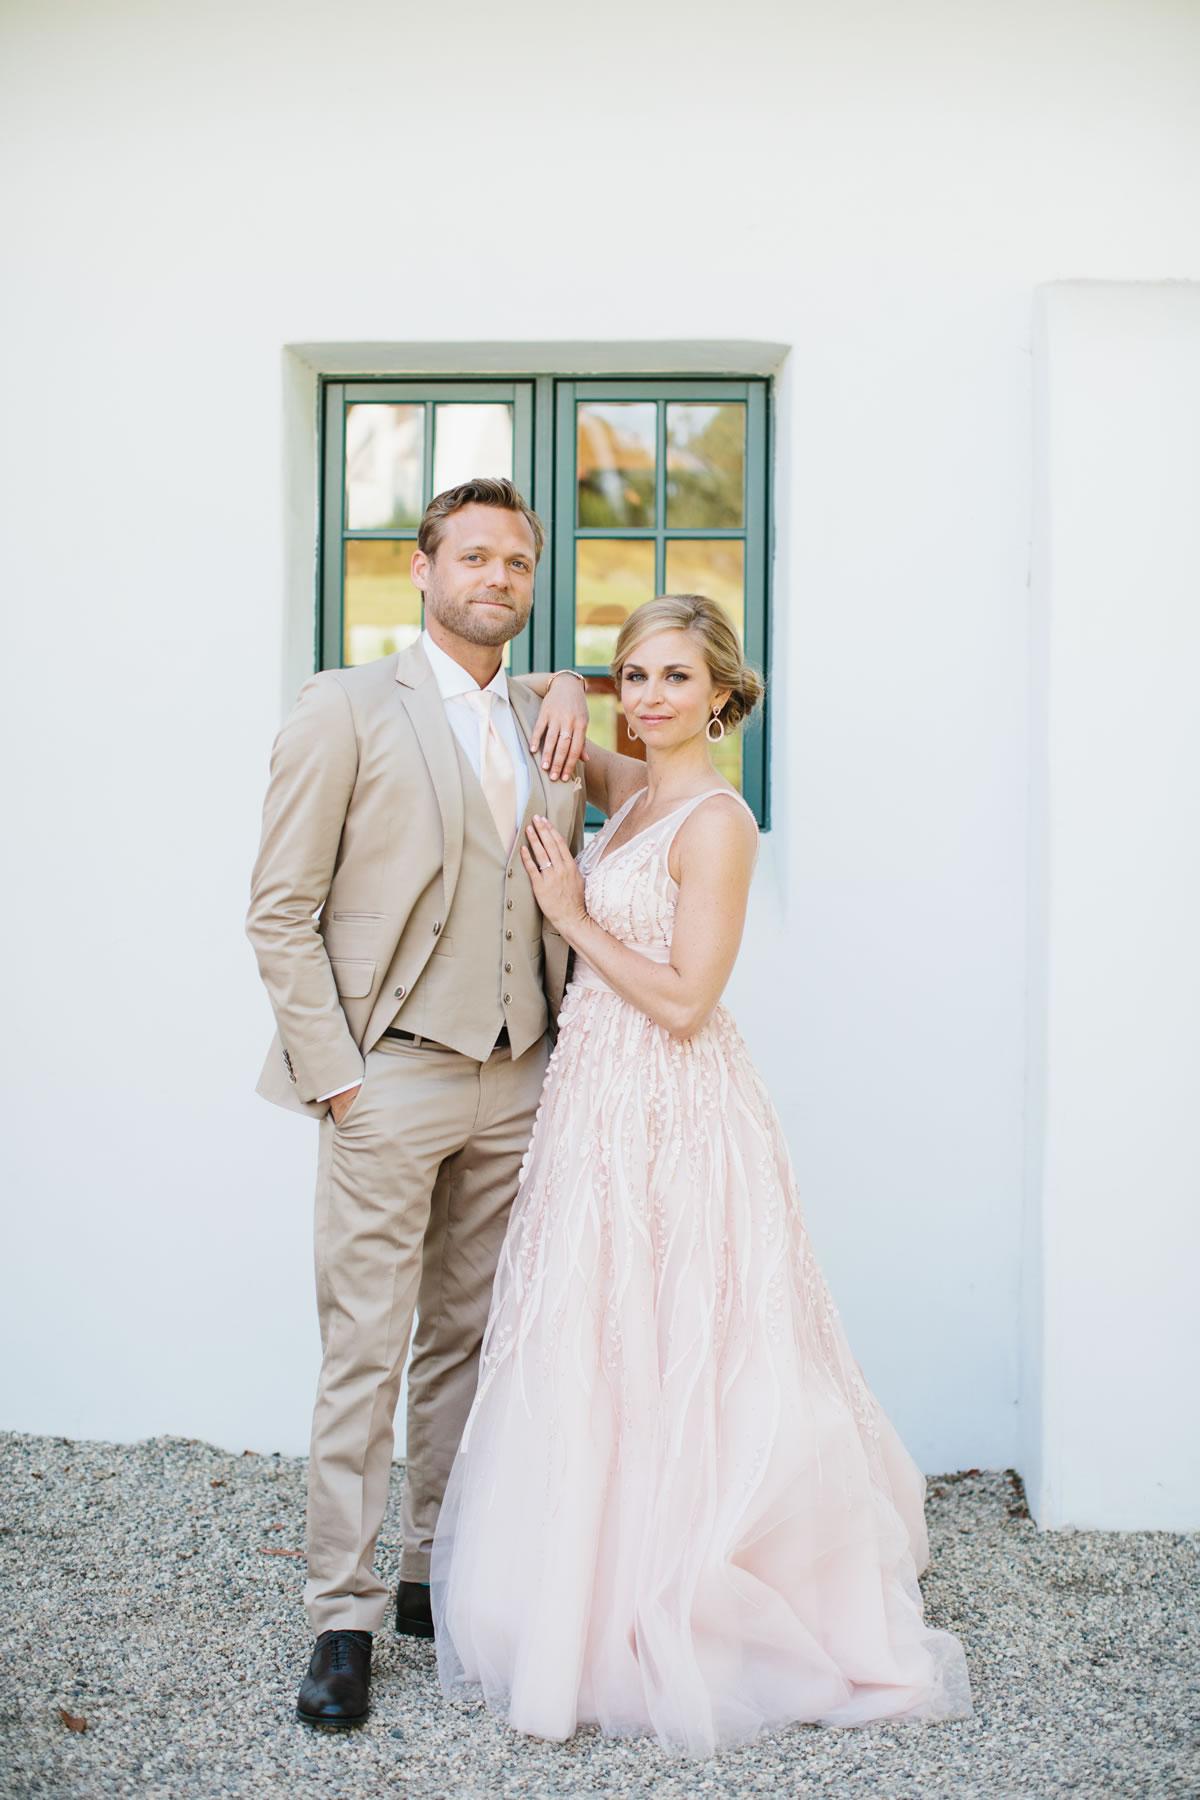 XOXO-BRIDE-Marianne-Wilson-Photography-JD-formals-166-3354146429-O